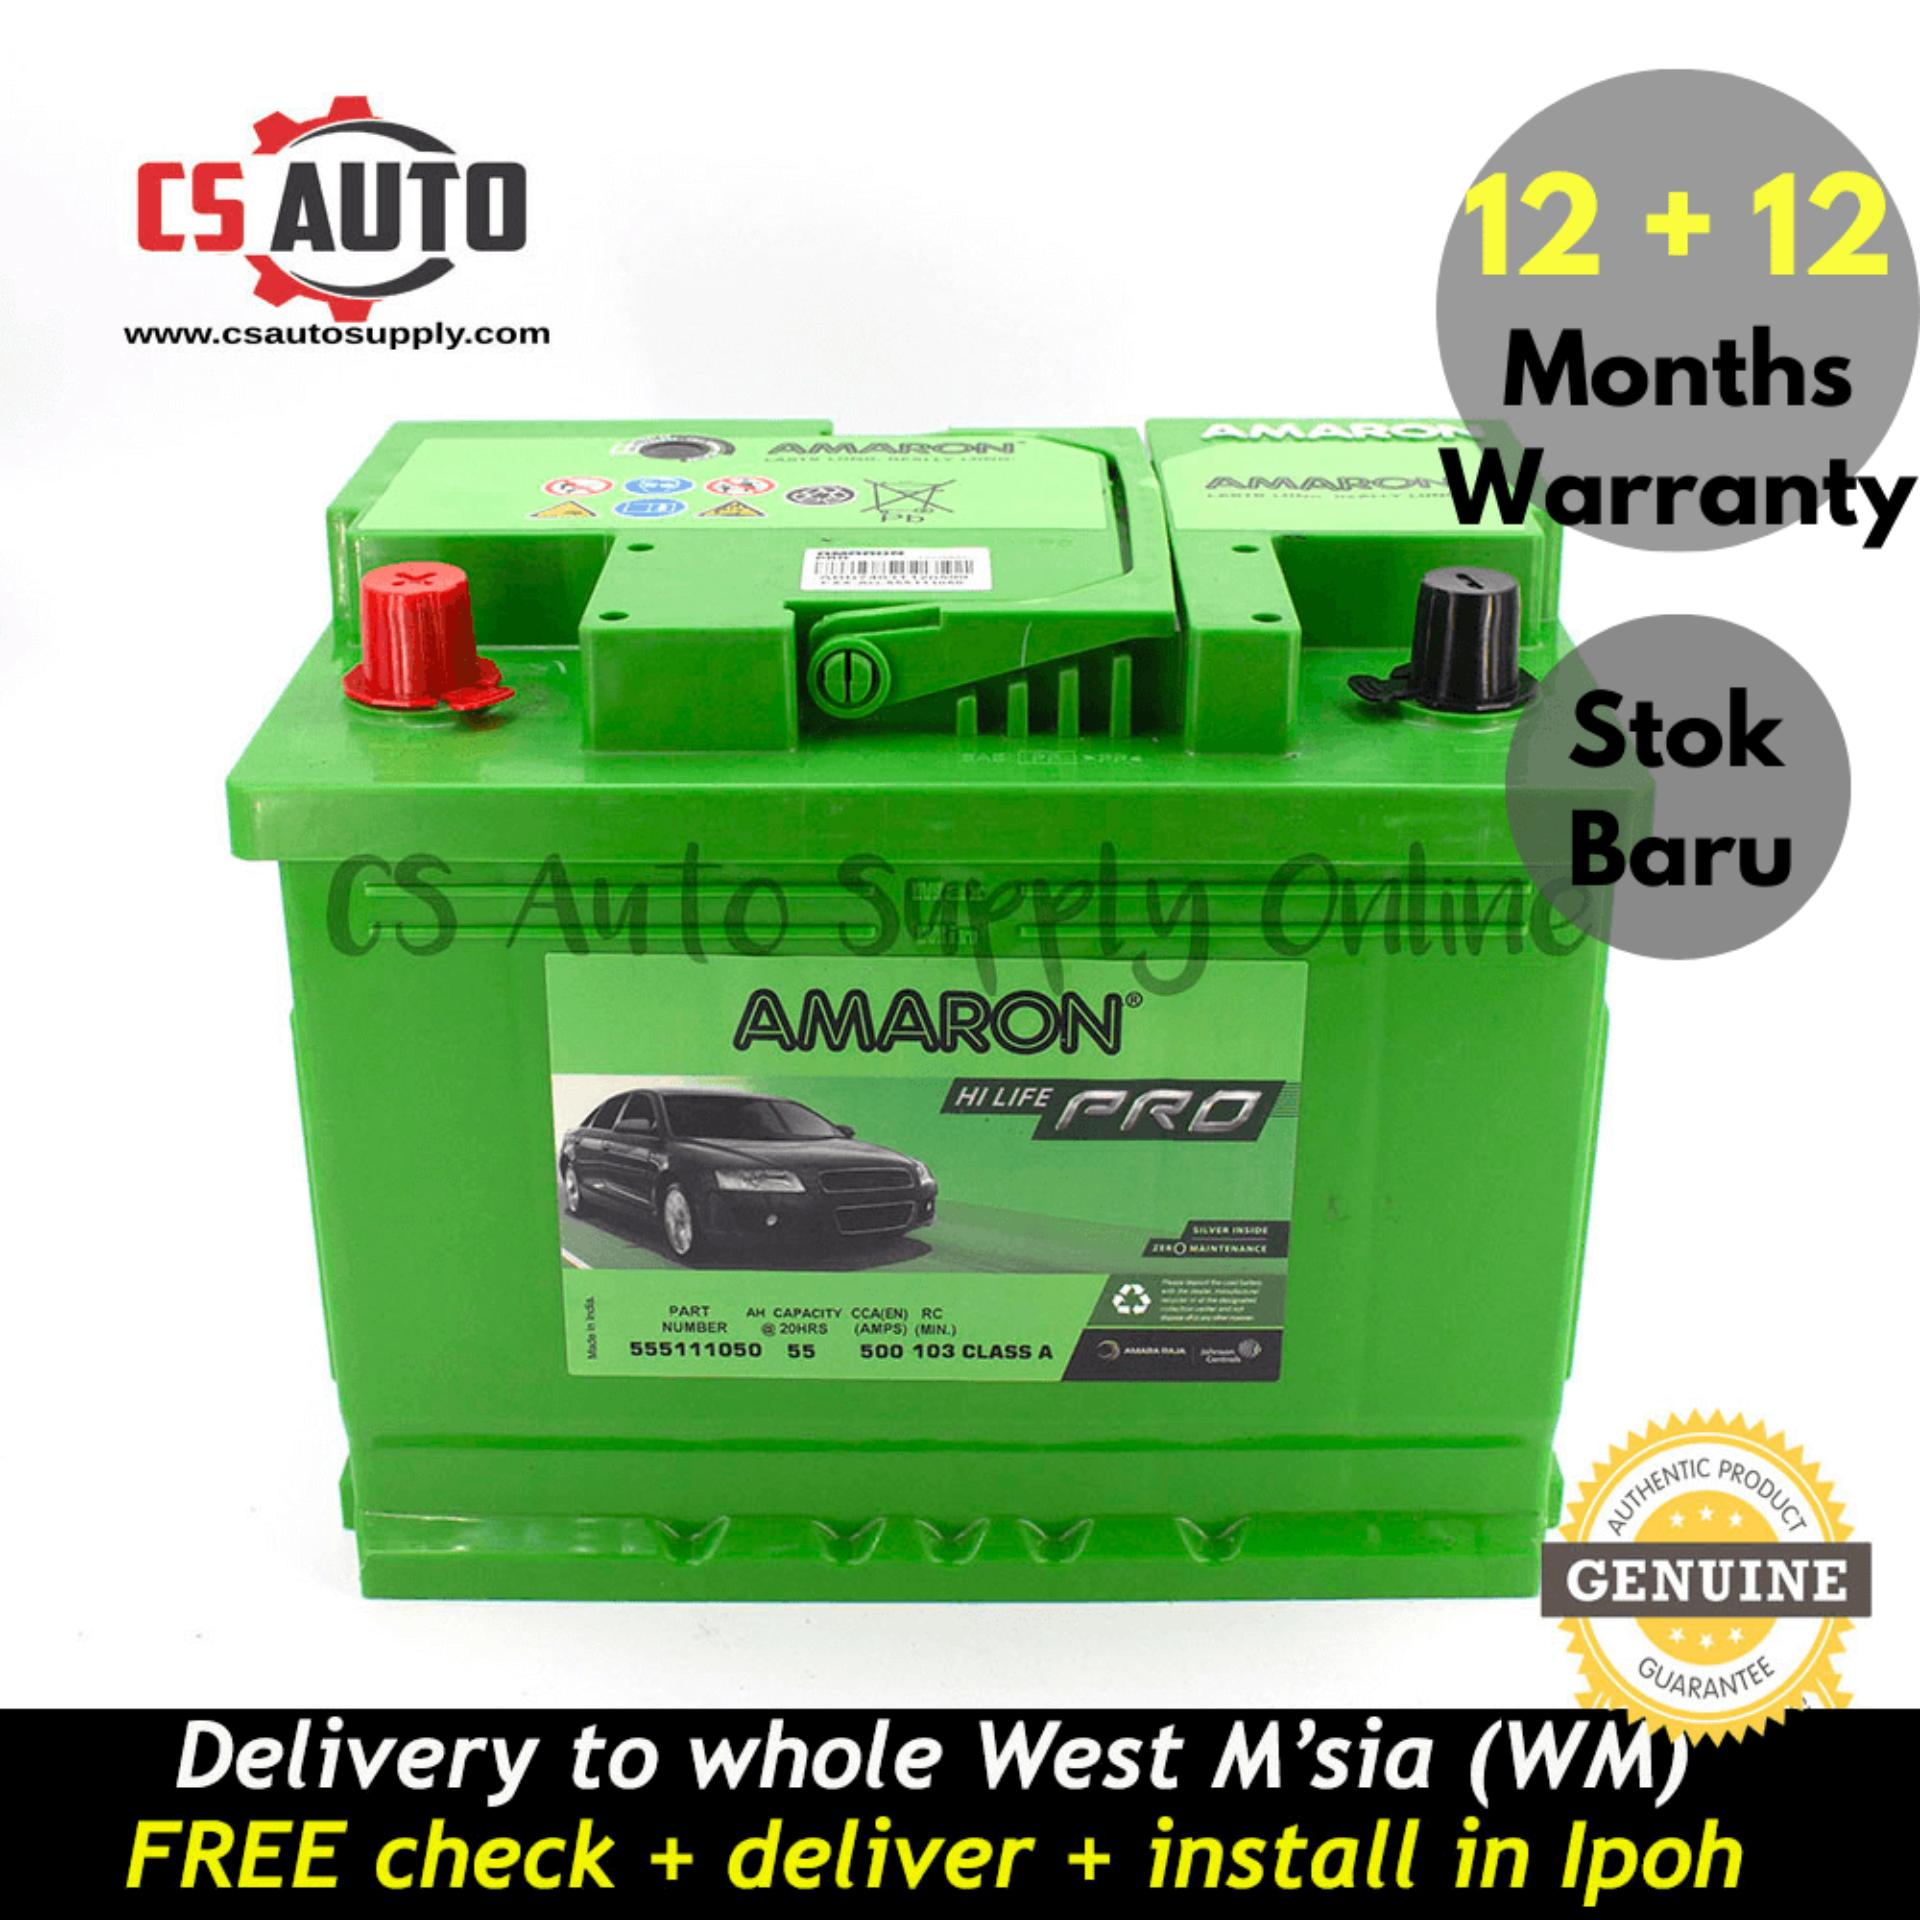 Amaron DIN55 DIN55R Hi Life Pro Battery MF Genuine for Proton Persona, Gen 2 and Satria Neo Ipoh